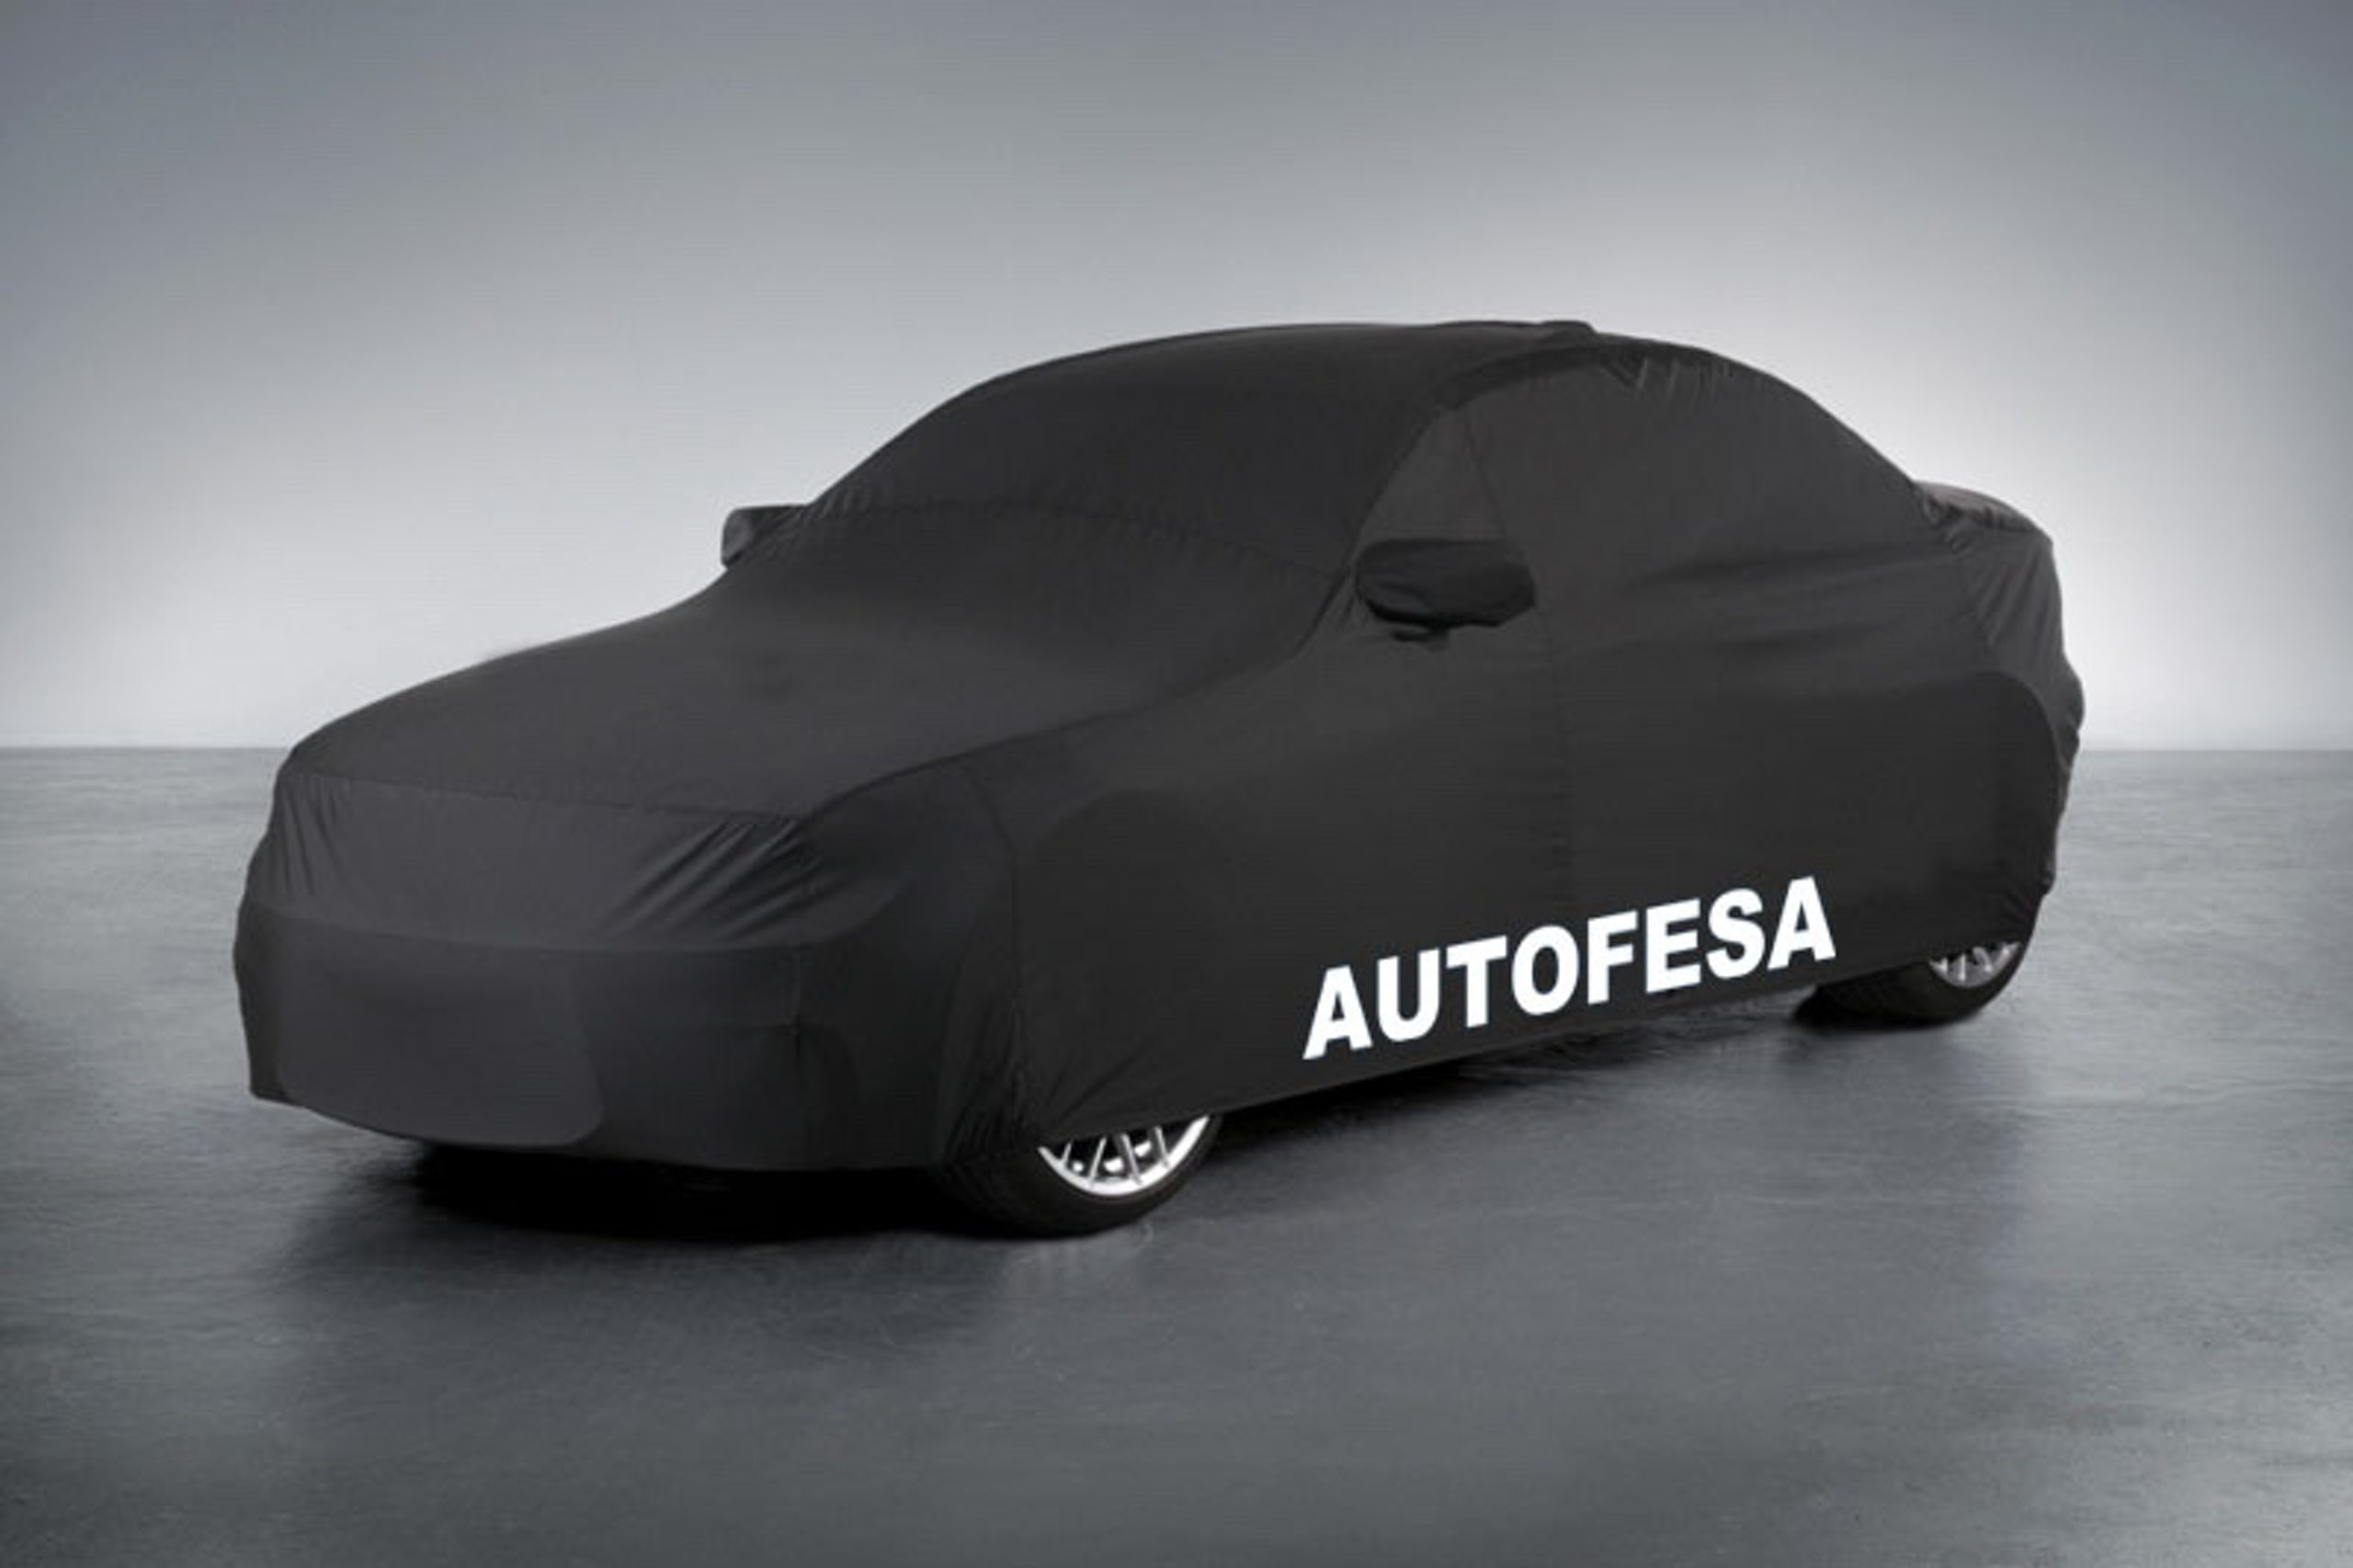 Mitsubishi Outlander 2.2 DI-D 150cv Motion 2WD S/S 7plazas 5p